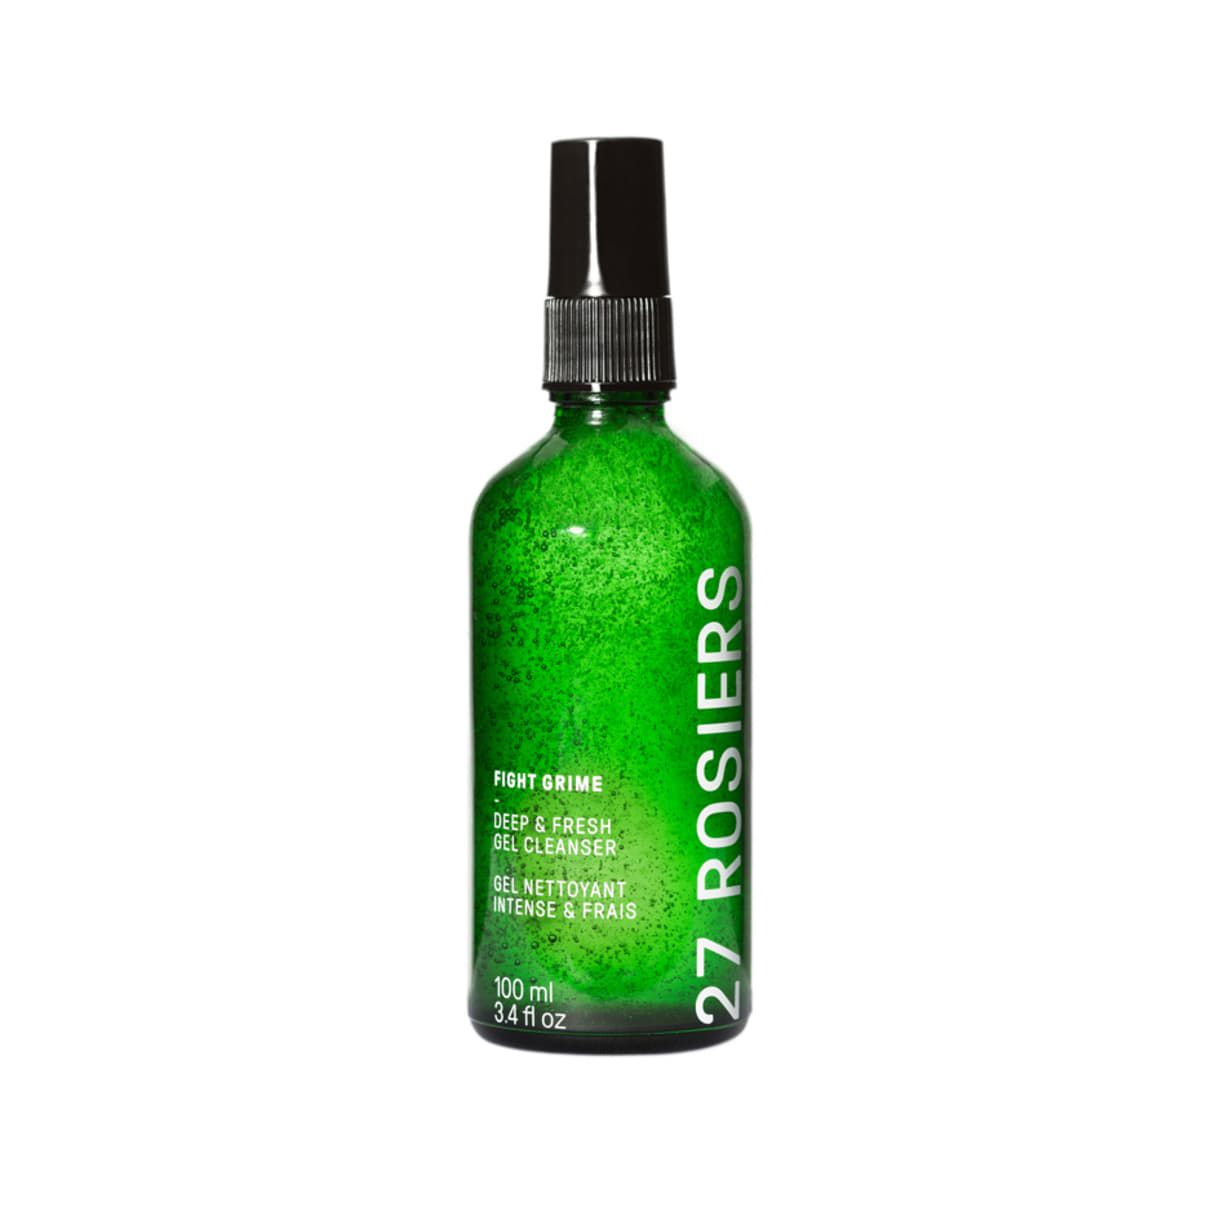 Fight Grime Deep & Fresh Gel cleanser